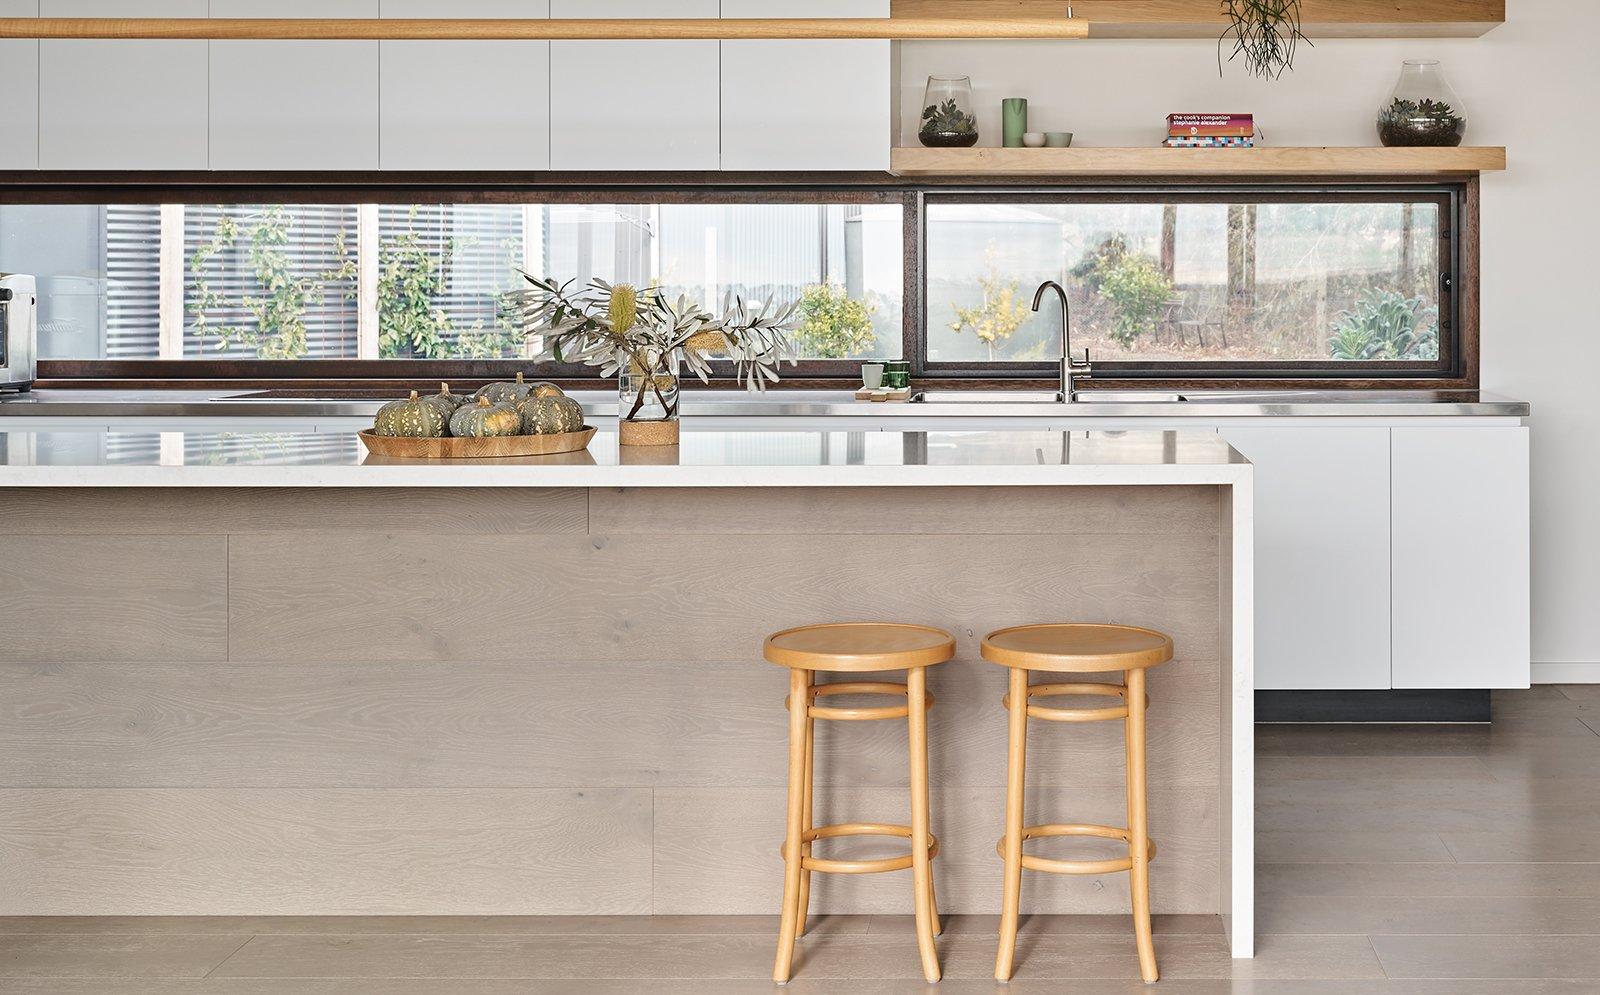 Kitchen, Ceiling Lighting, Medium Hardwood Floor, White Cabinet, Undermount Sink, and Engineered Quartz Counter  The Balnarring Beach House